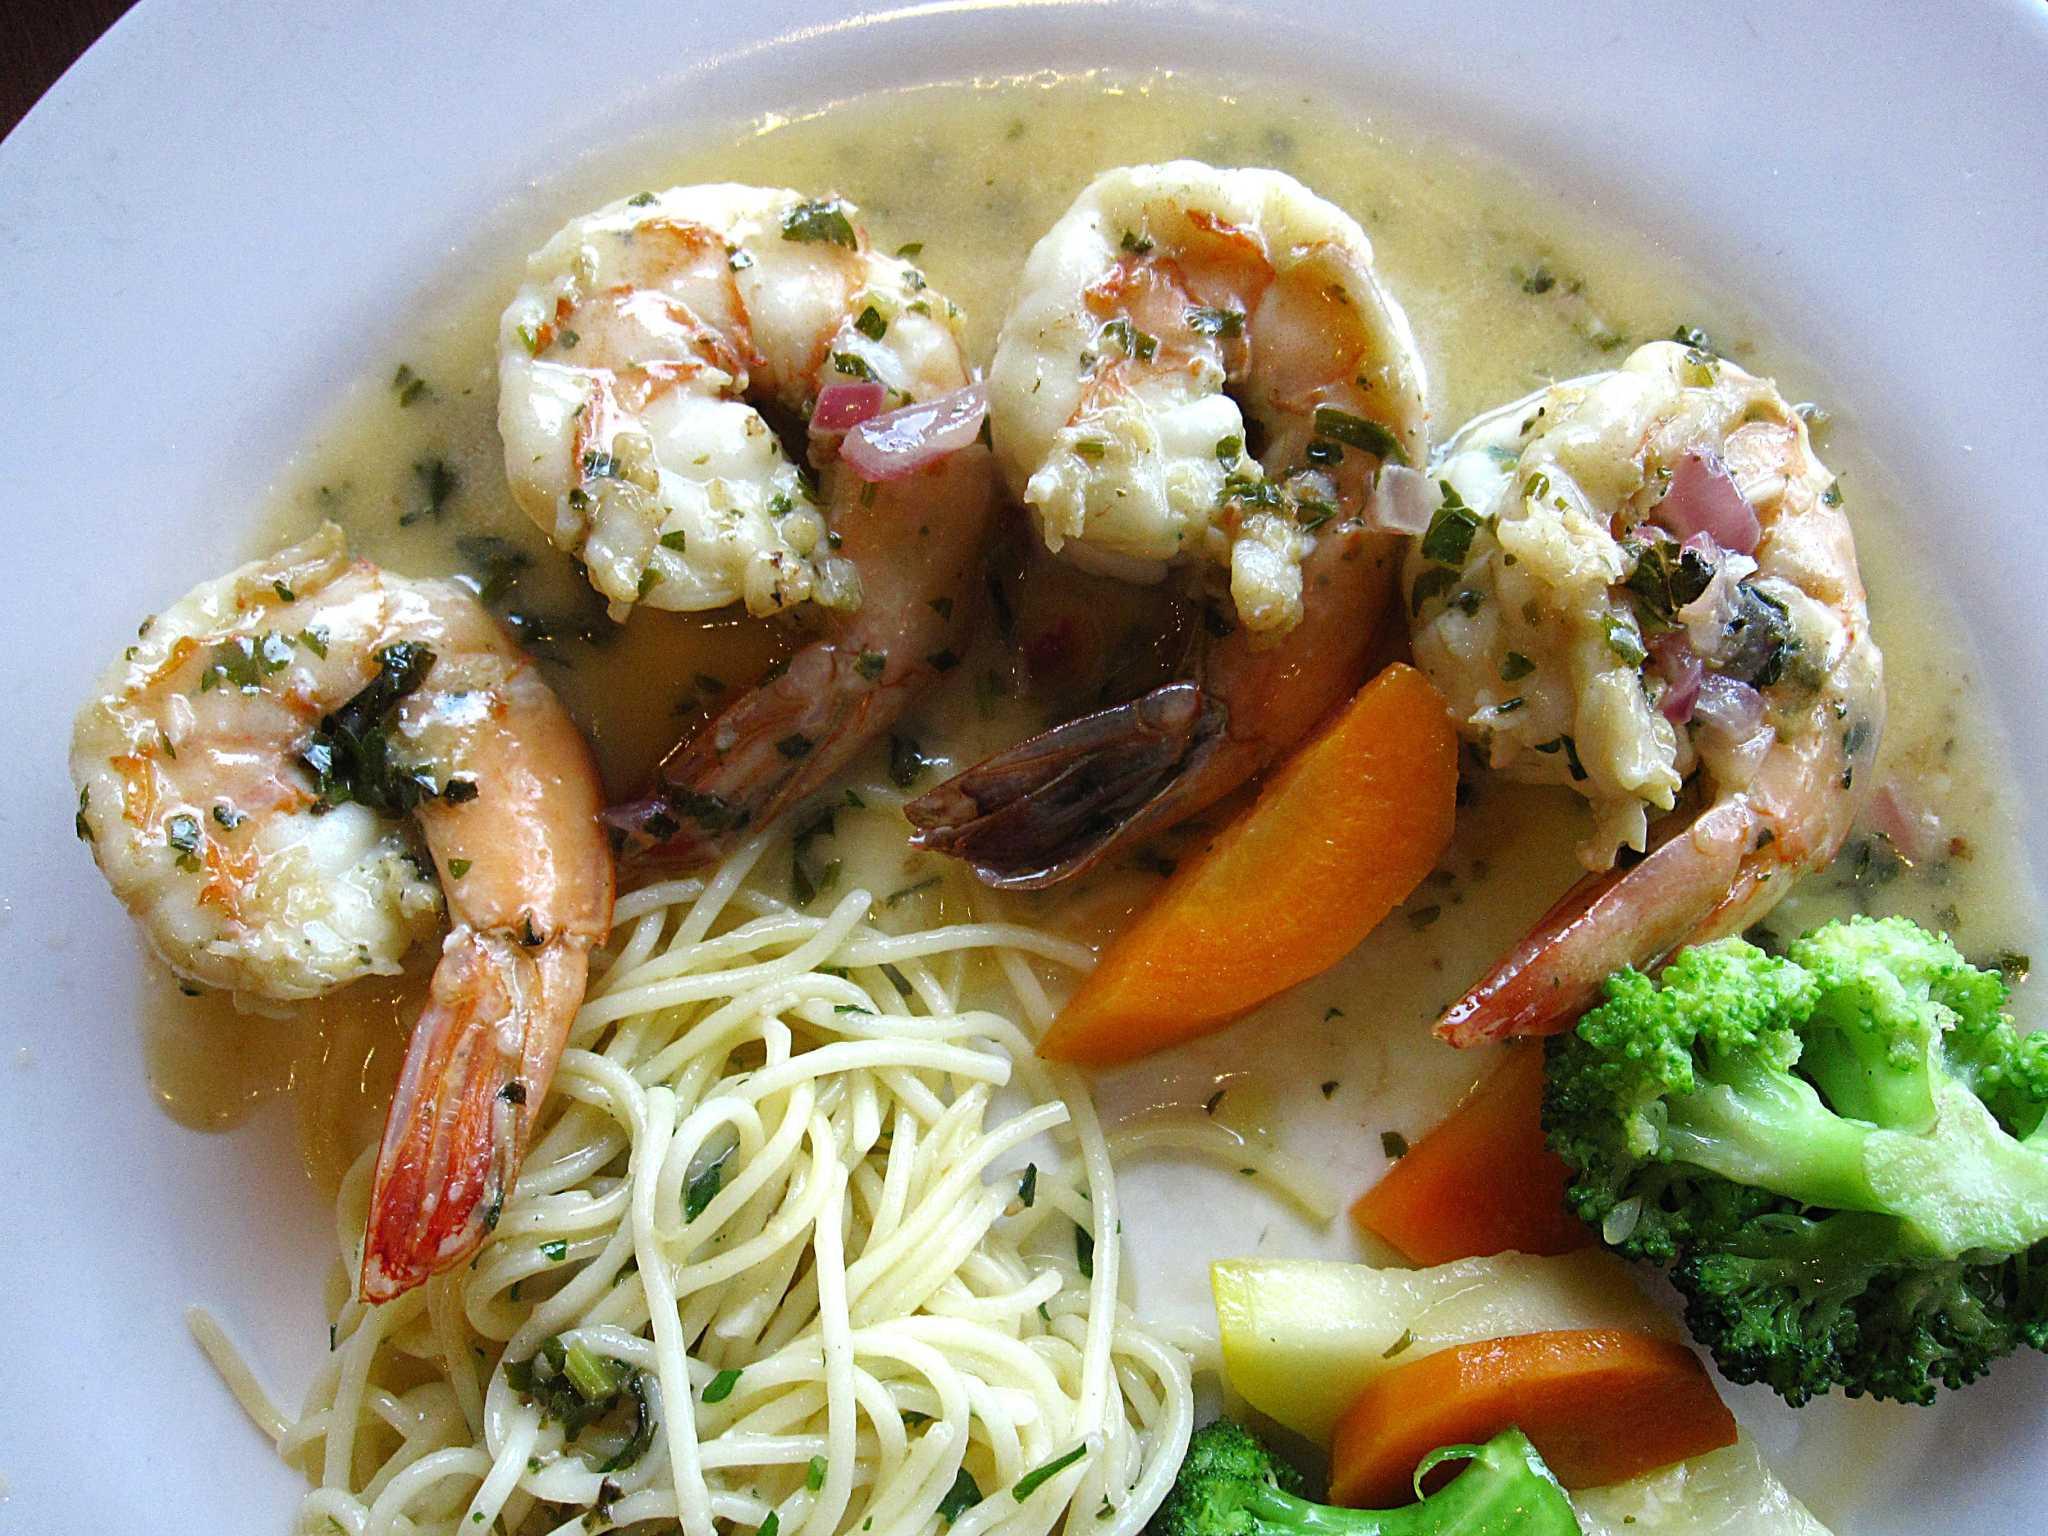 Review Aldino at The Vineyard outpacing sister restaurant Aldo s